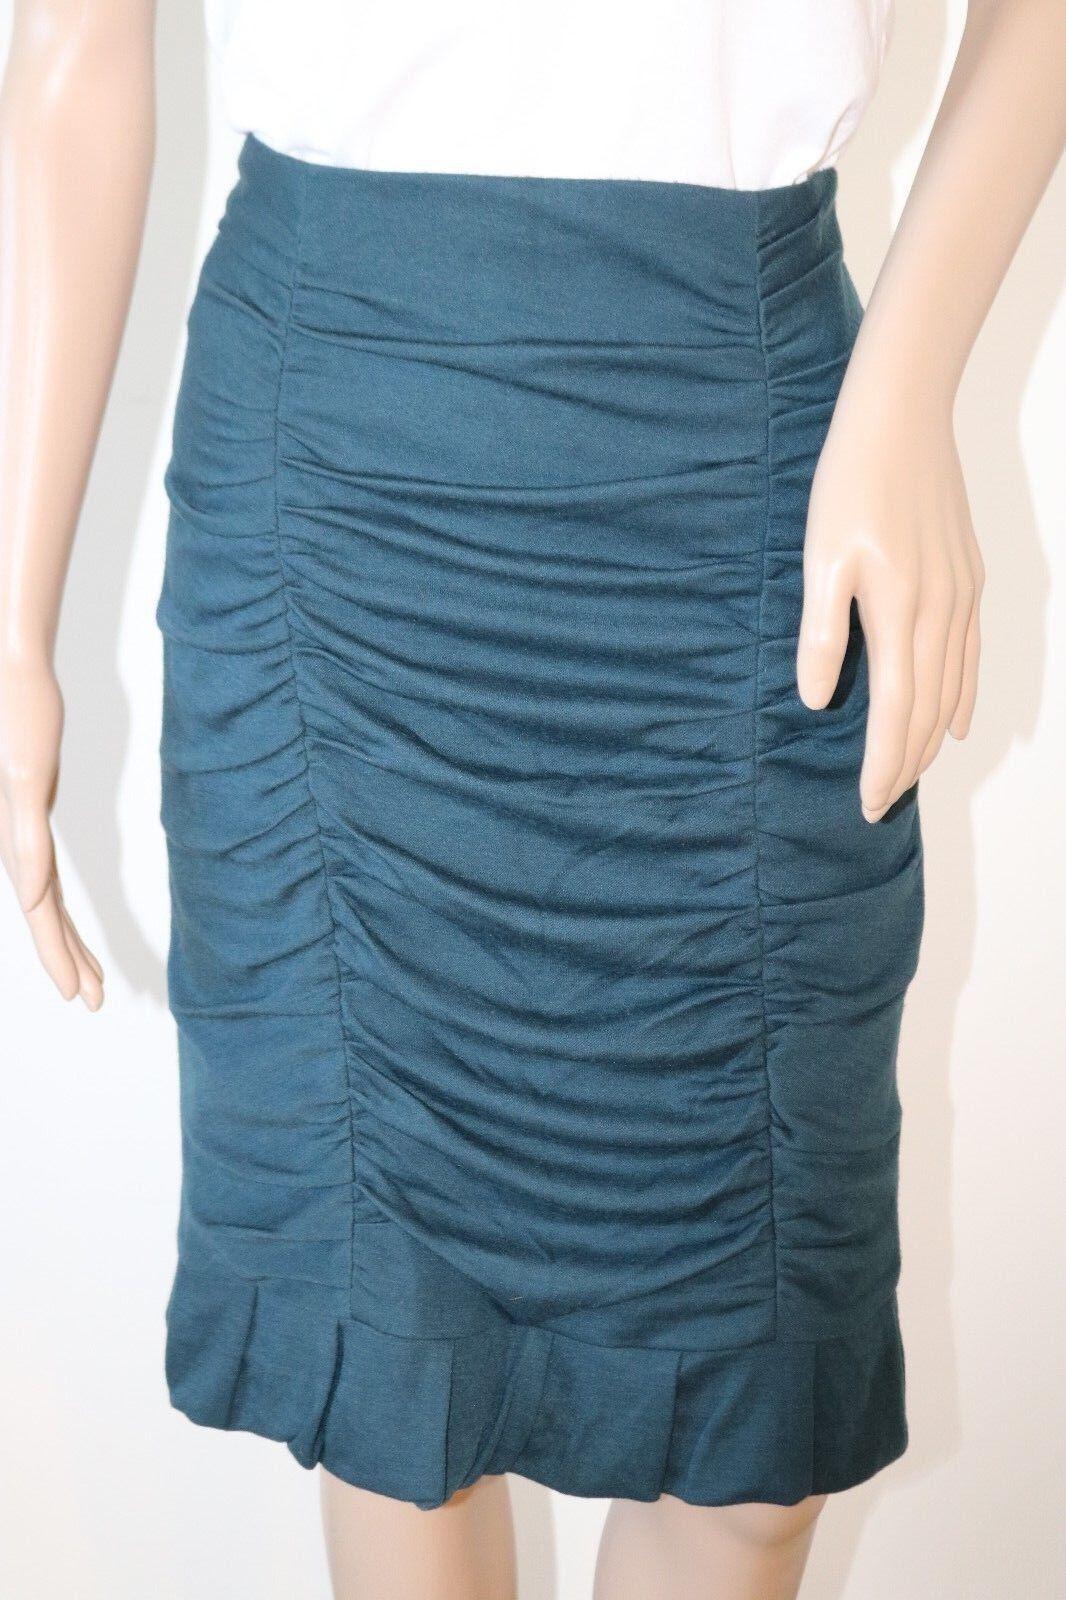 NWT, Anthropologie, Nanette Lepore, Shenanigan Skirt, Size 8